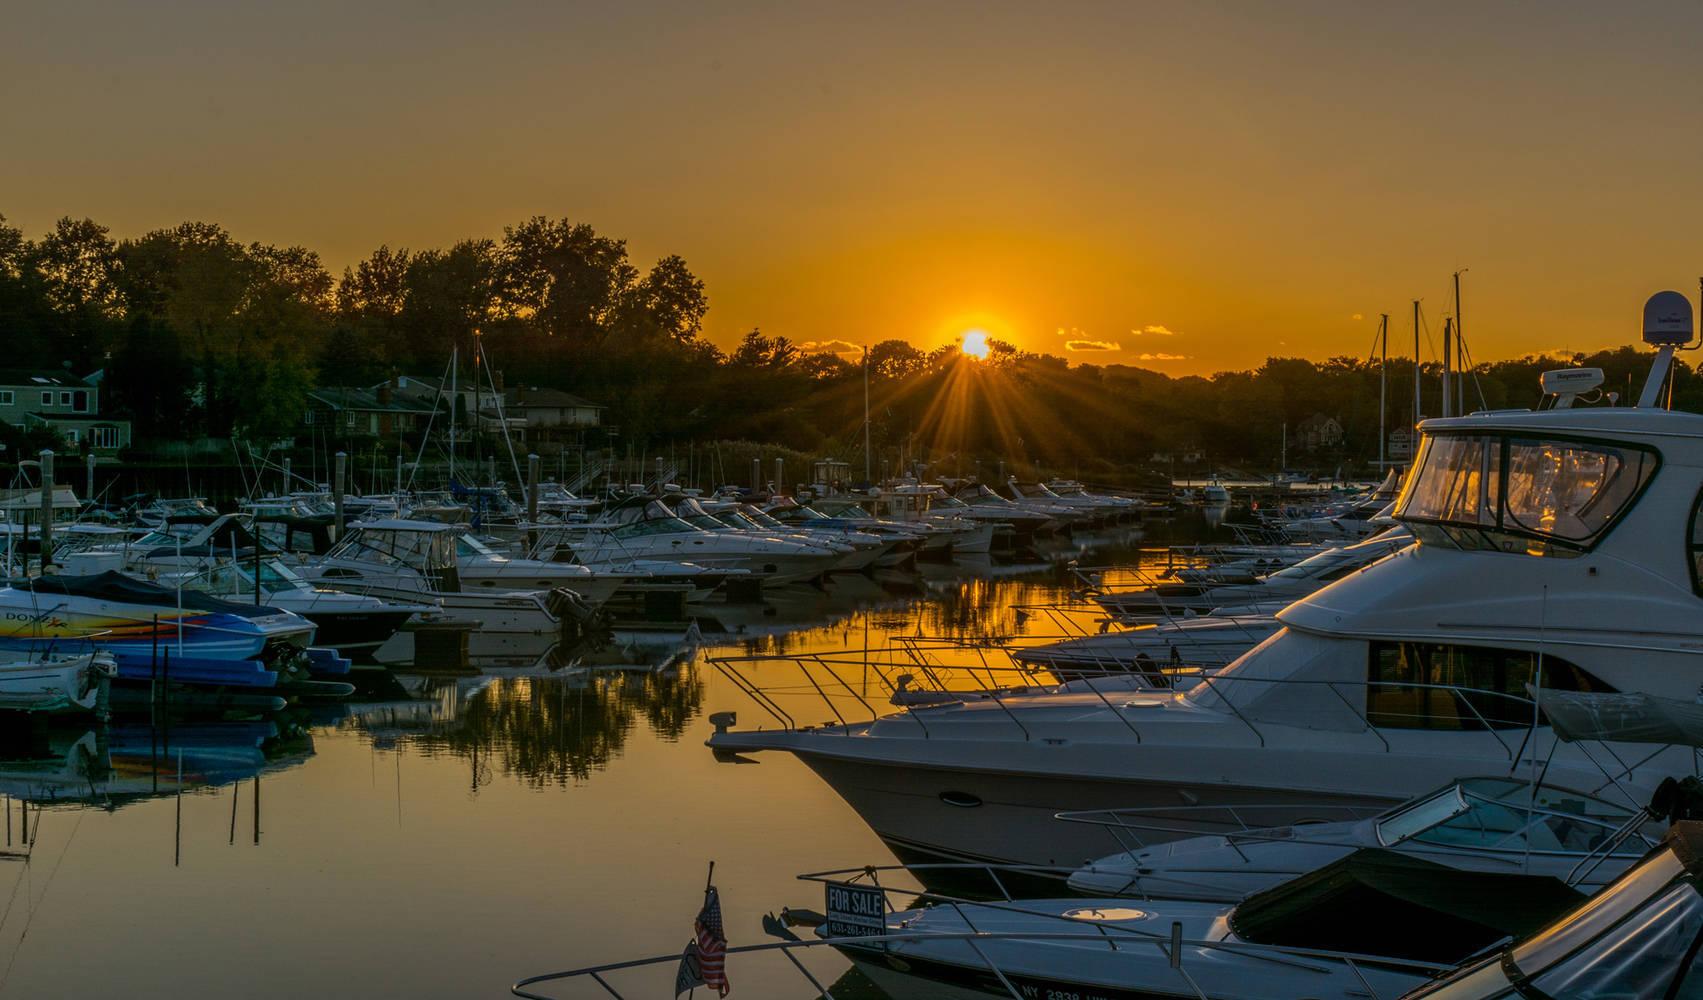 Britannia Yachting Center Slip Dock Mooring Reservations